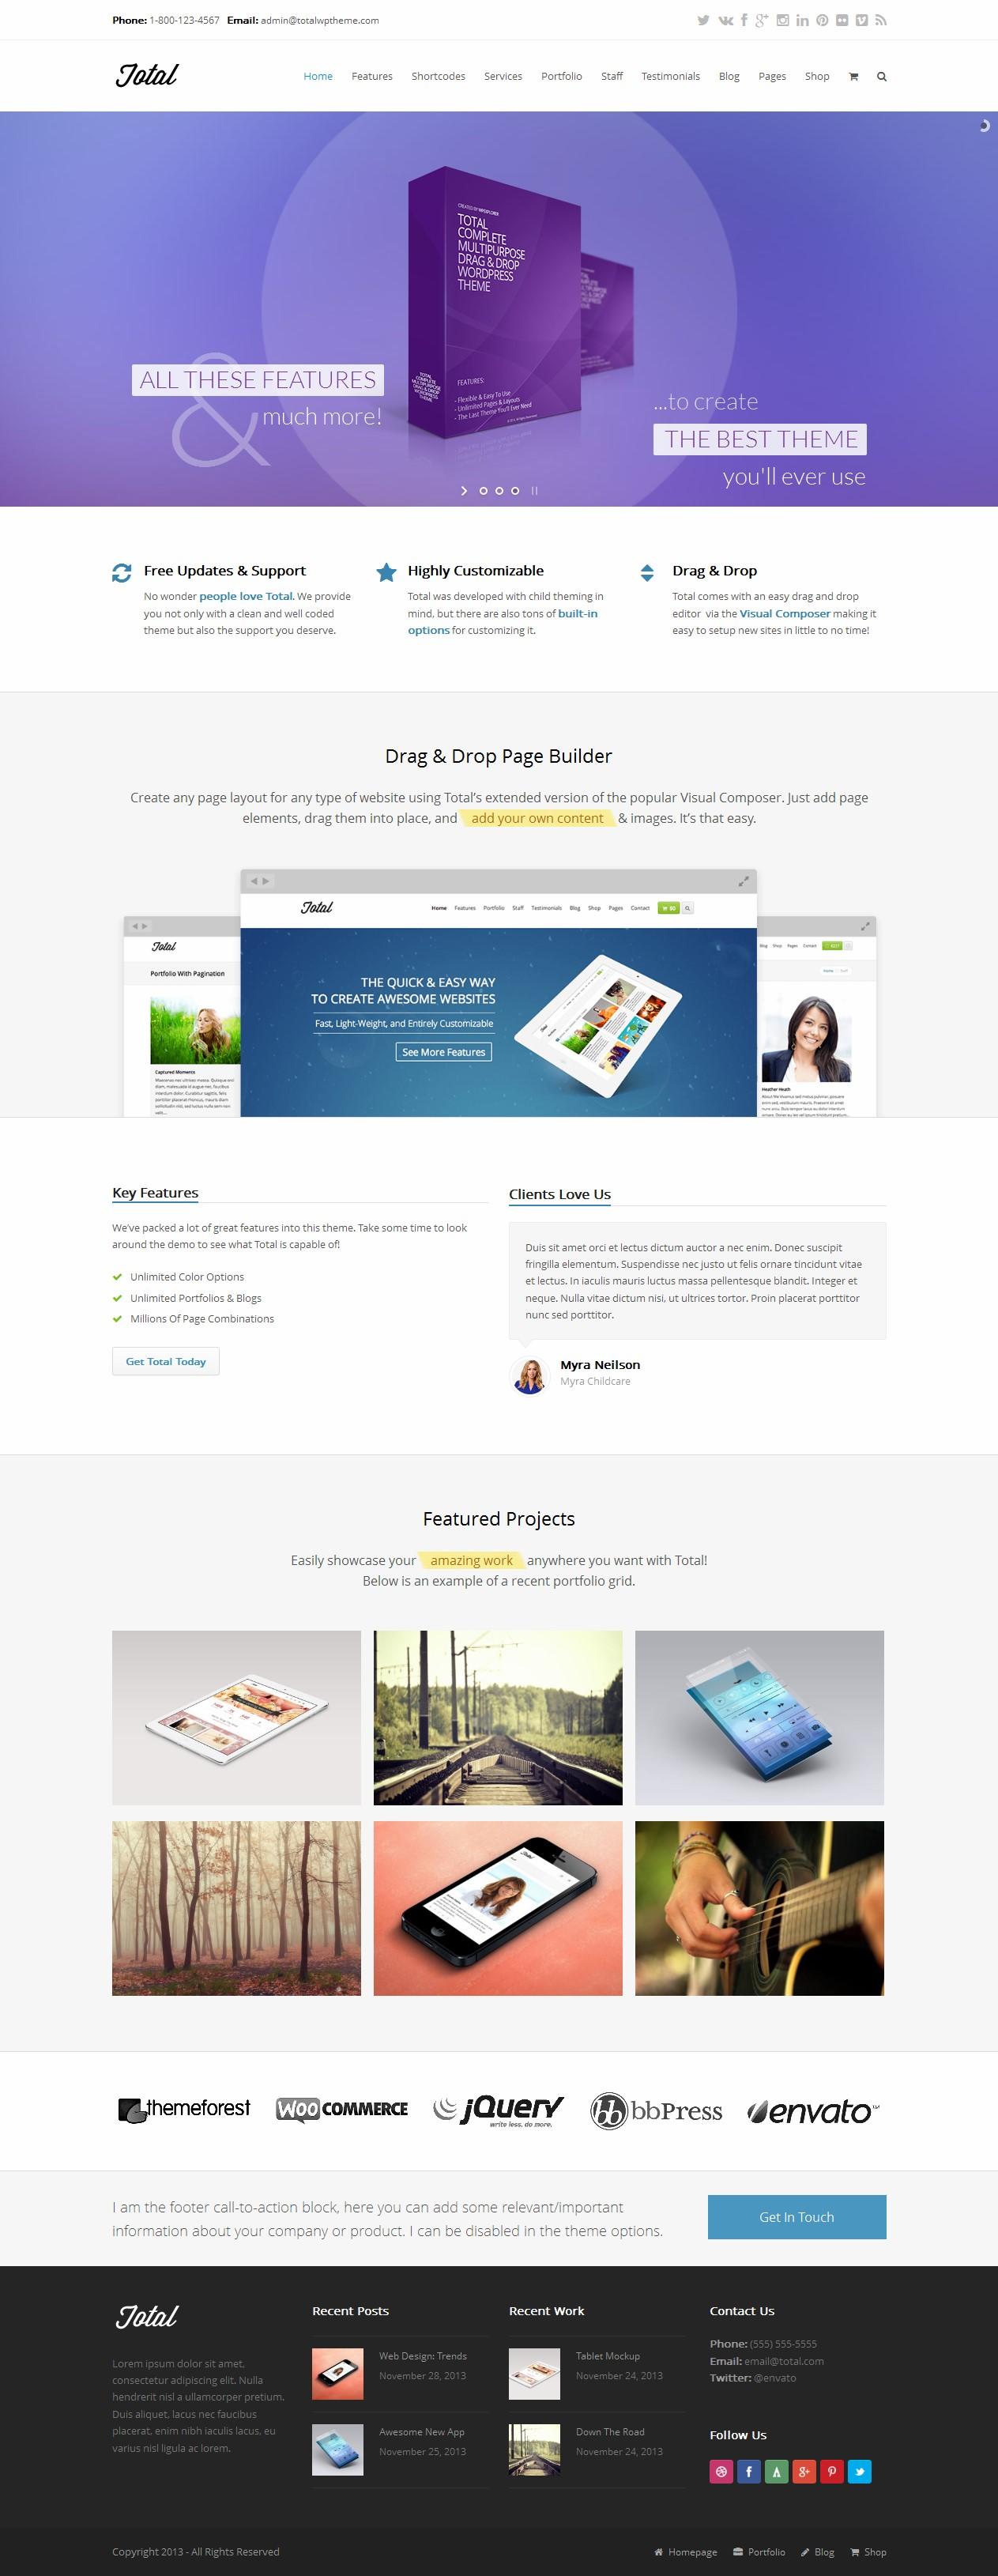 total-wordpress-responsive-theme-11